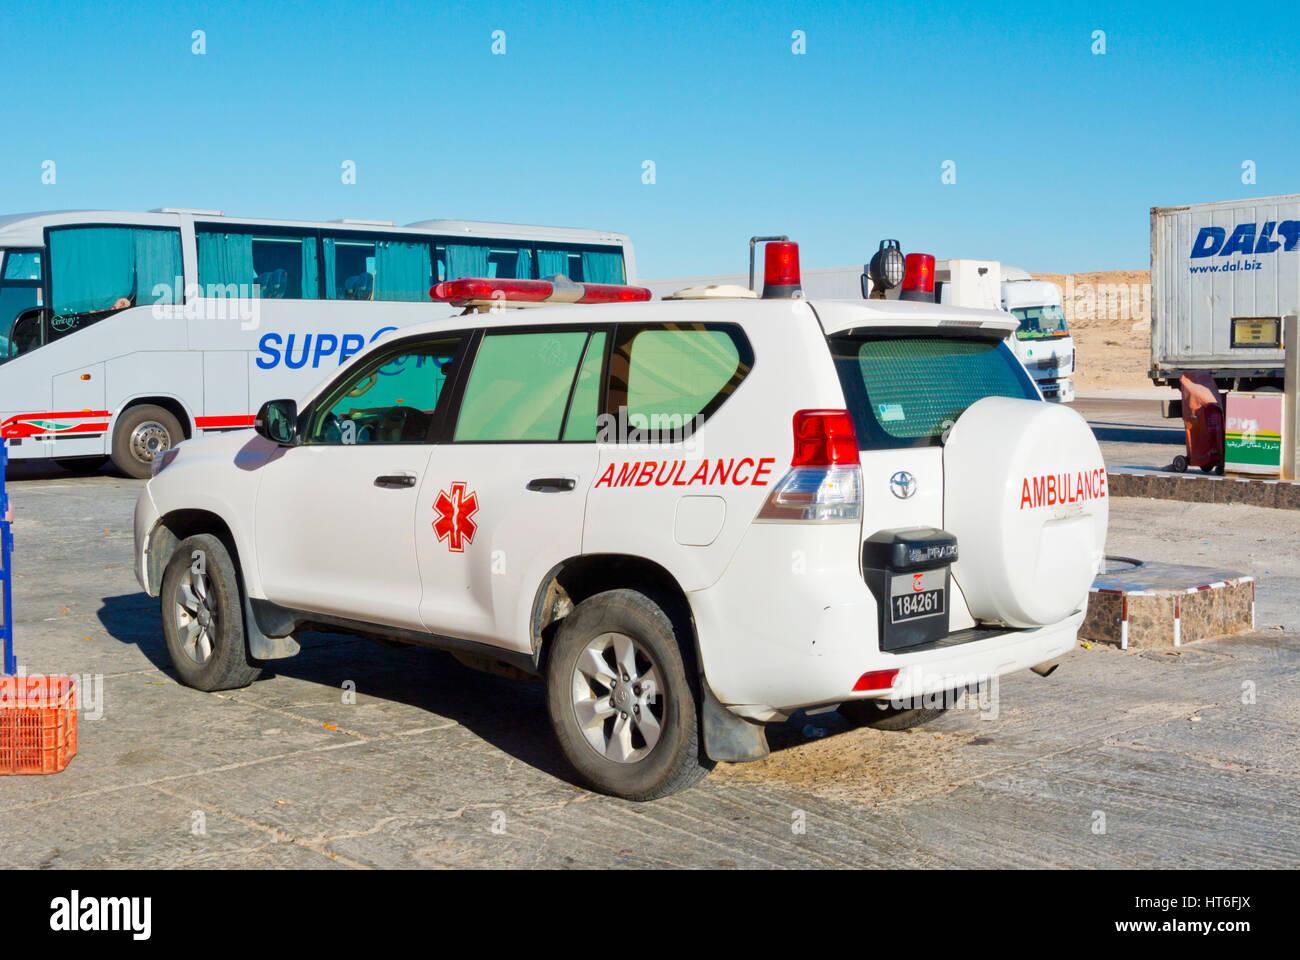 SUV ambulance, Petrom Sahara service station, N1 road, between Boujdour and Dakhla, Western Sahara, administered Stock Photo